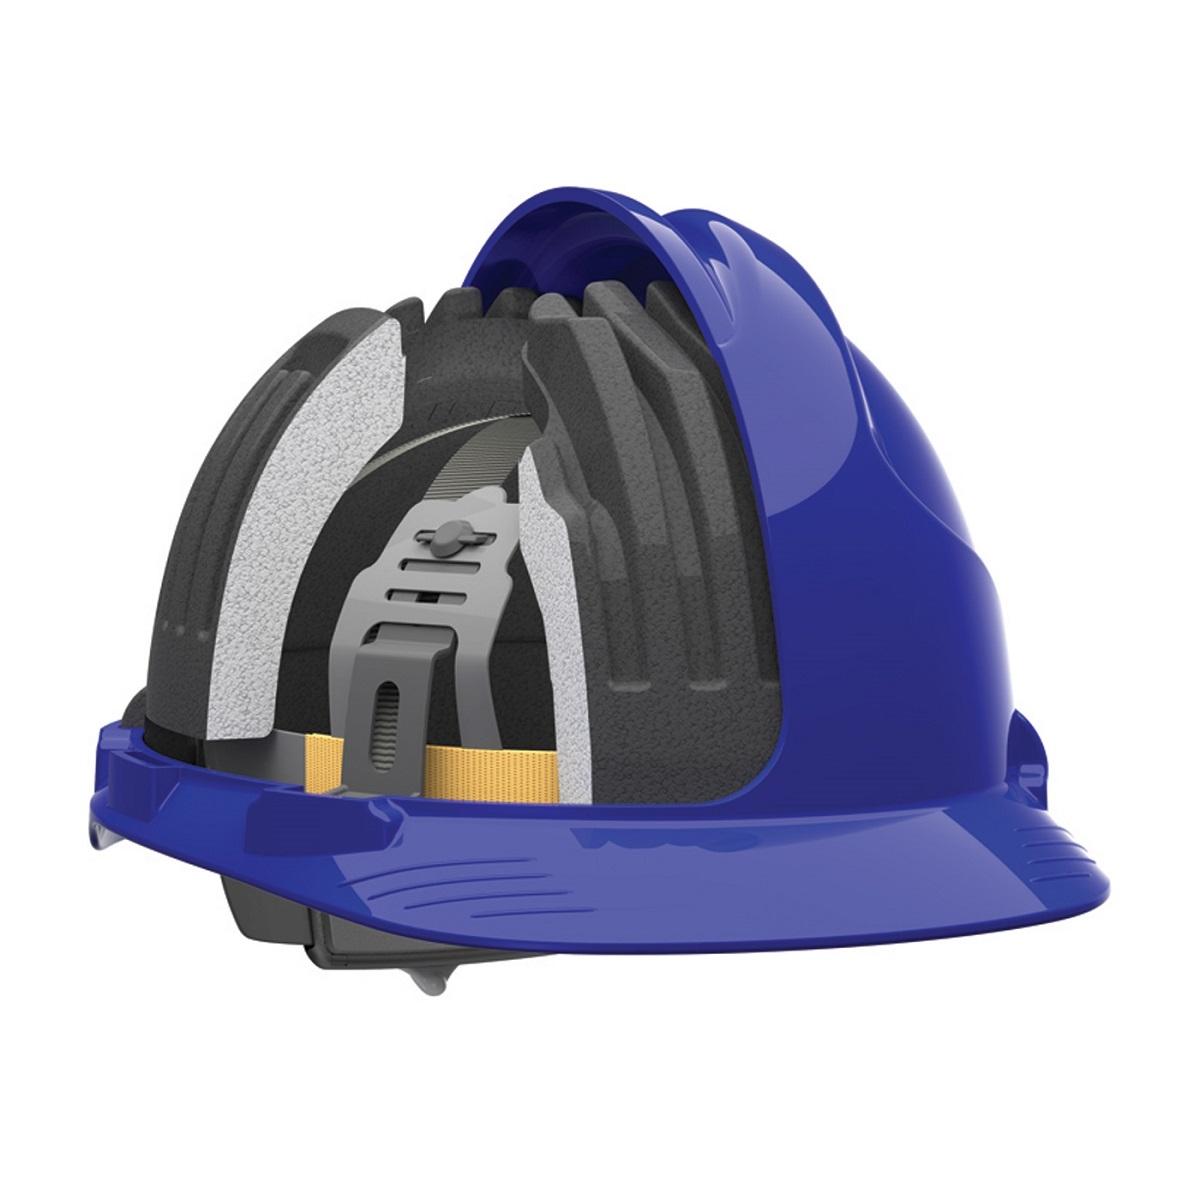 Full Brim ANSI Type 2 Hard Hat - The Home Depot